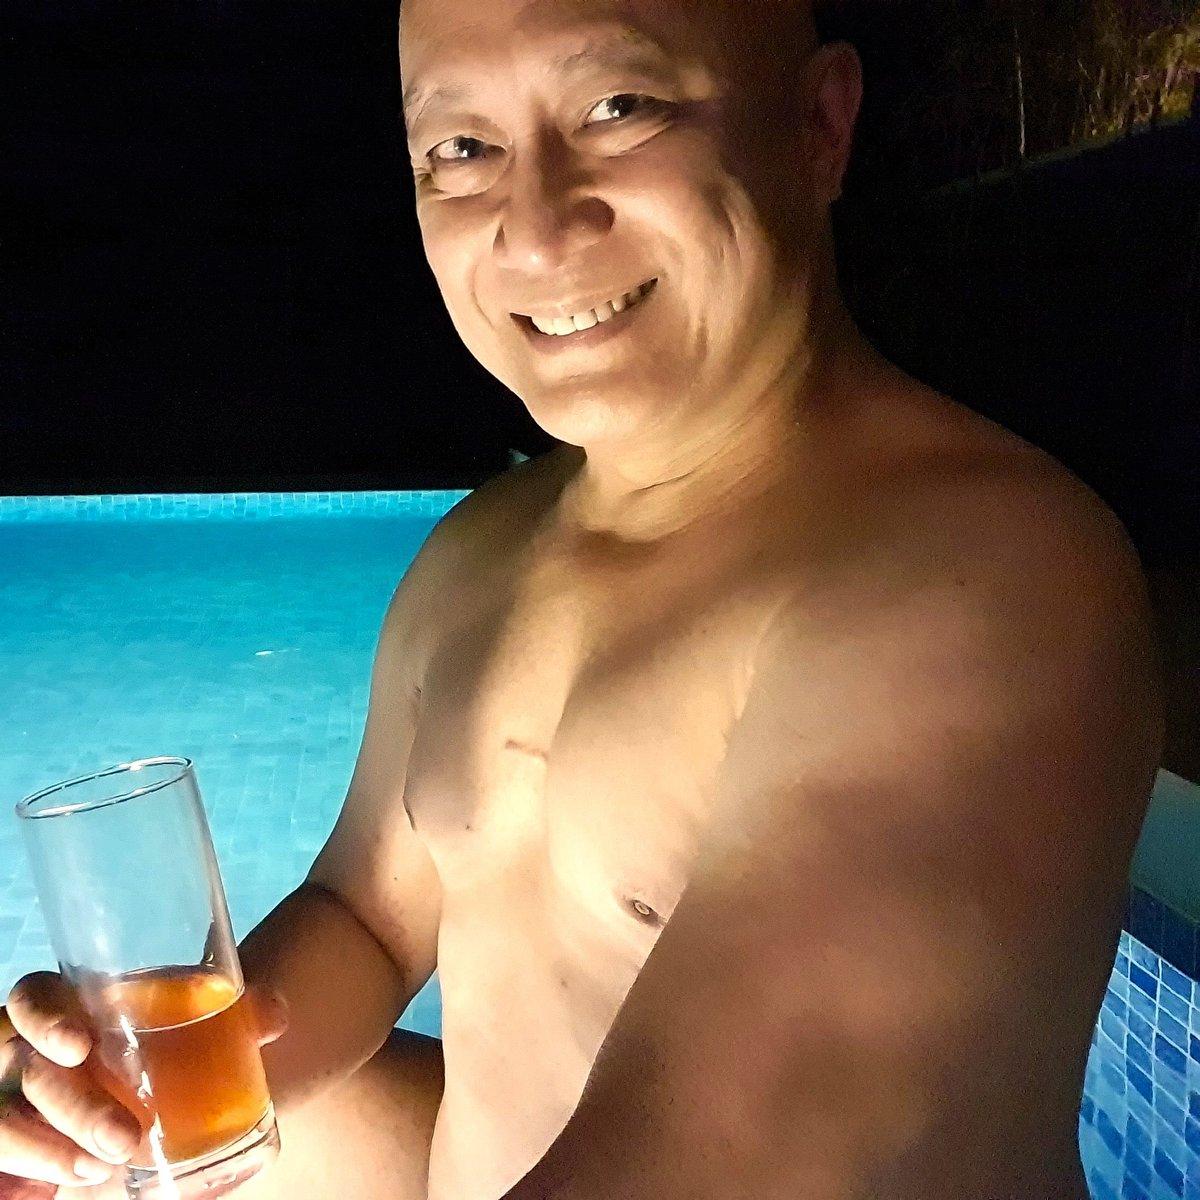 Chillaxin' in the wading pool in Kandaya Resort Cebu #beach #beachlife #beachvibes #beachday #beachstyle #vacation #vacationmode #vacay #vacationvibes #vacations #vacationtime #vacaymode #pool #swim #swimming #swimmingpool #private #whisky #whiskey #singlemalt https://t.co/gM7lXDj81C